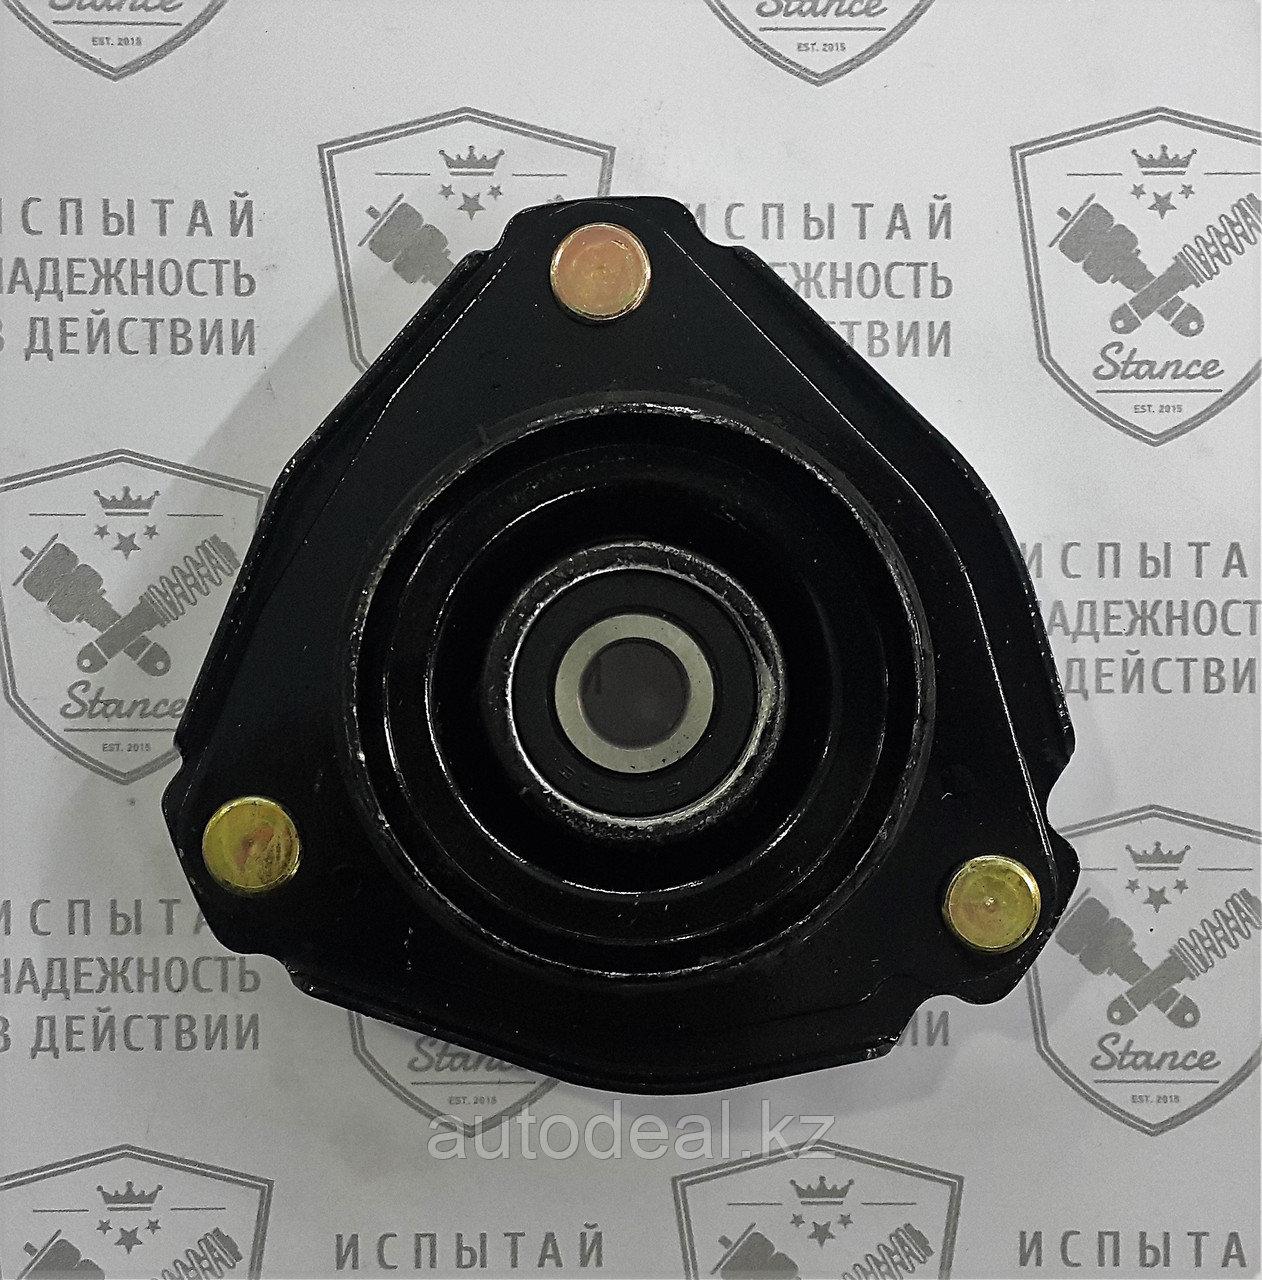 Опора переднего амортизатора (дубликат) Lifan X60 / Front shock absorber support (duplicate)